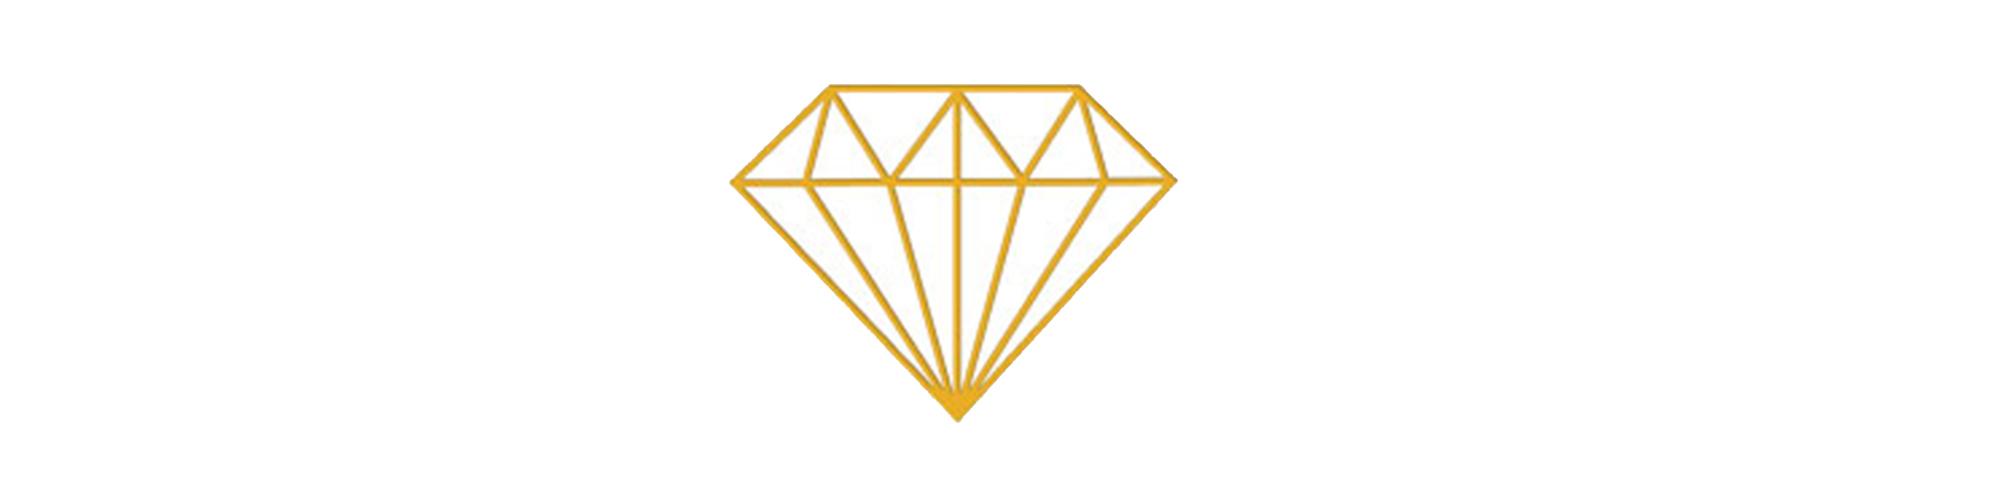 new diamond.jpg